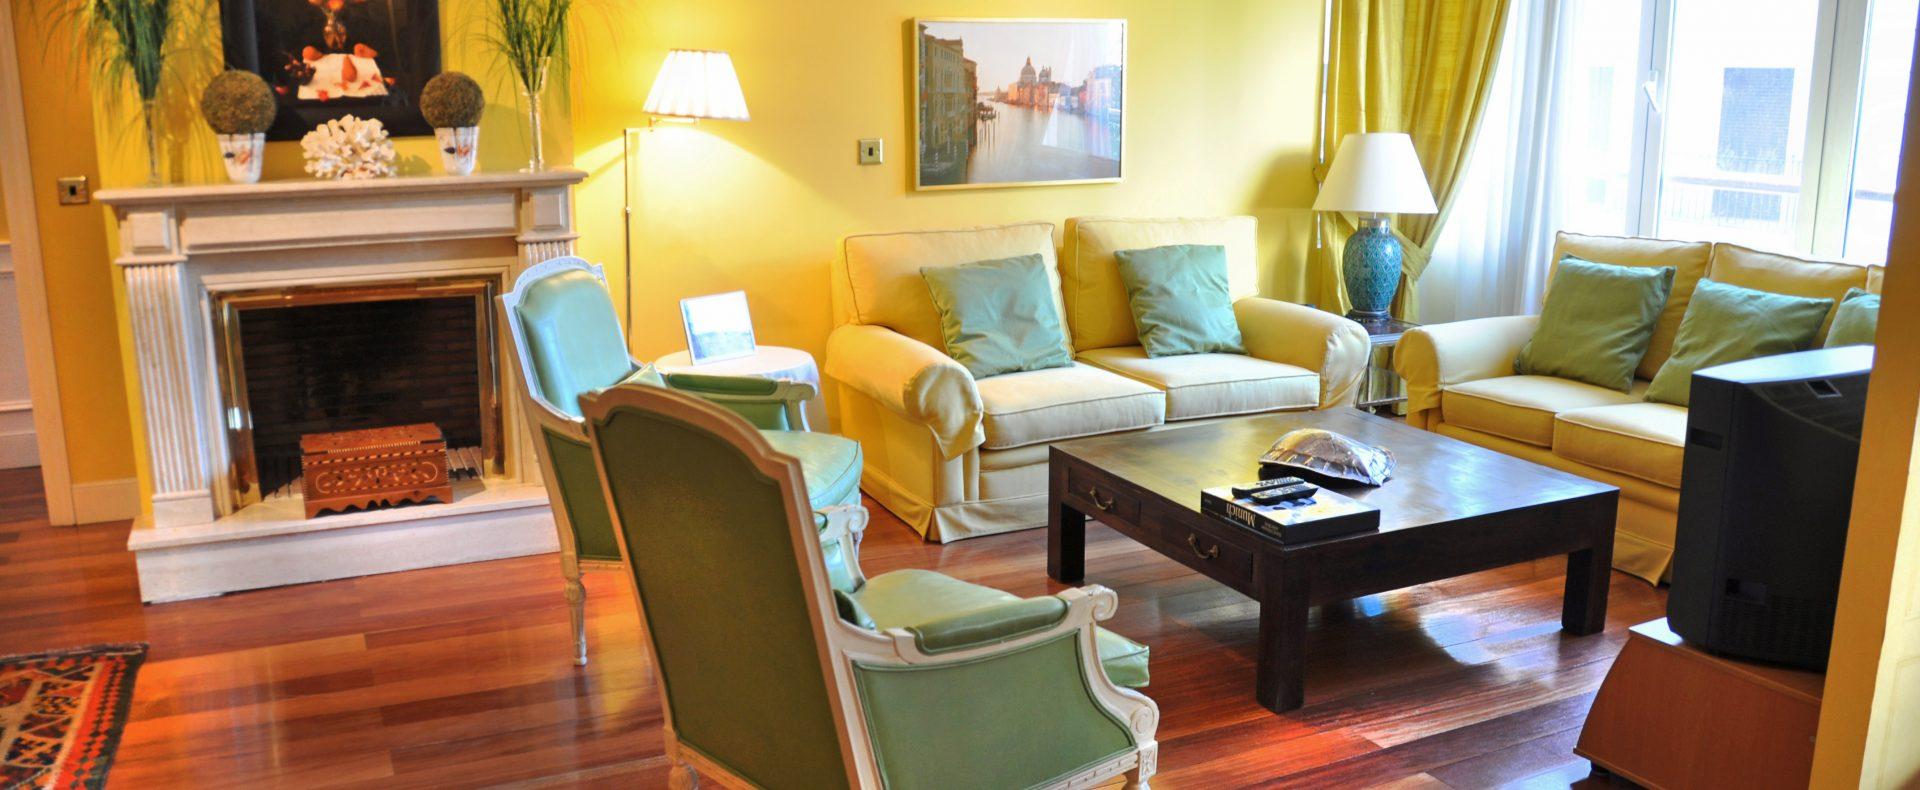 Rentapart magazine alquiler de apartamentos por d as en madrid - Apartamentos madrid centro por dias ...